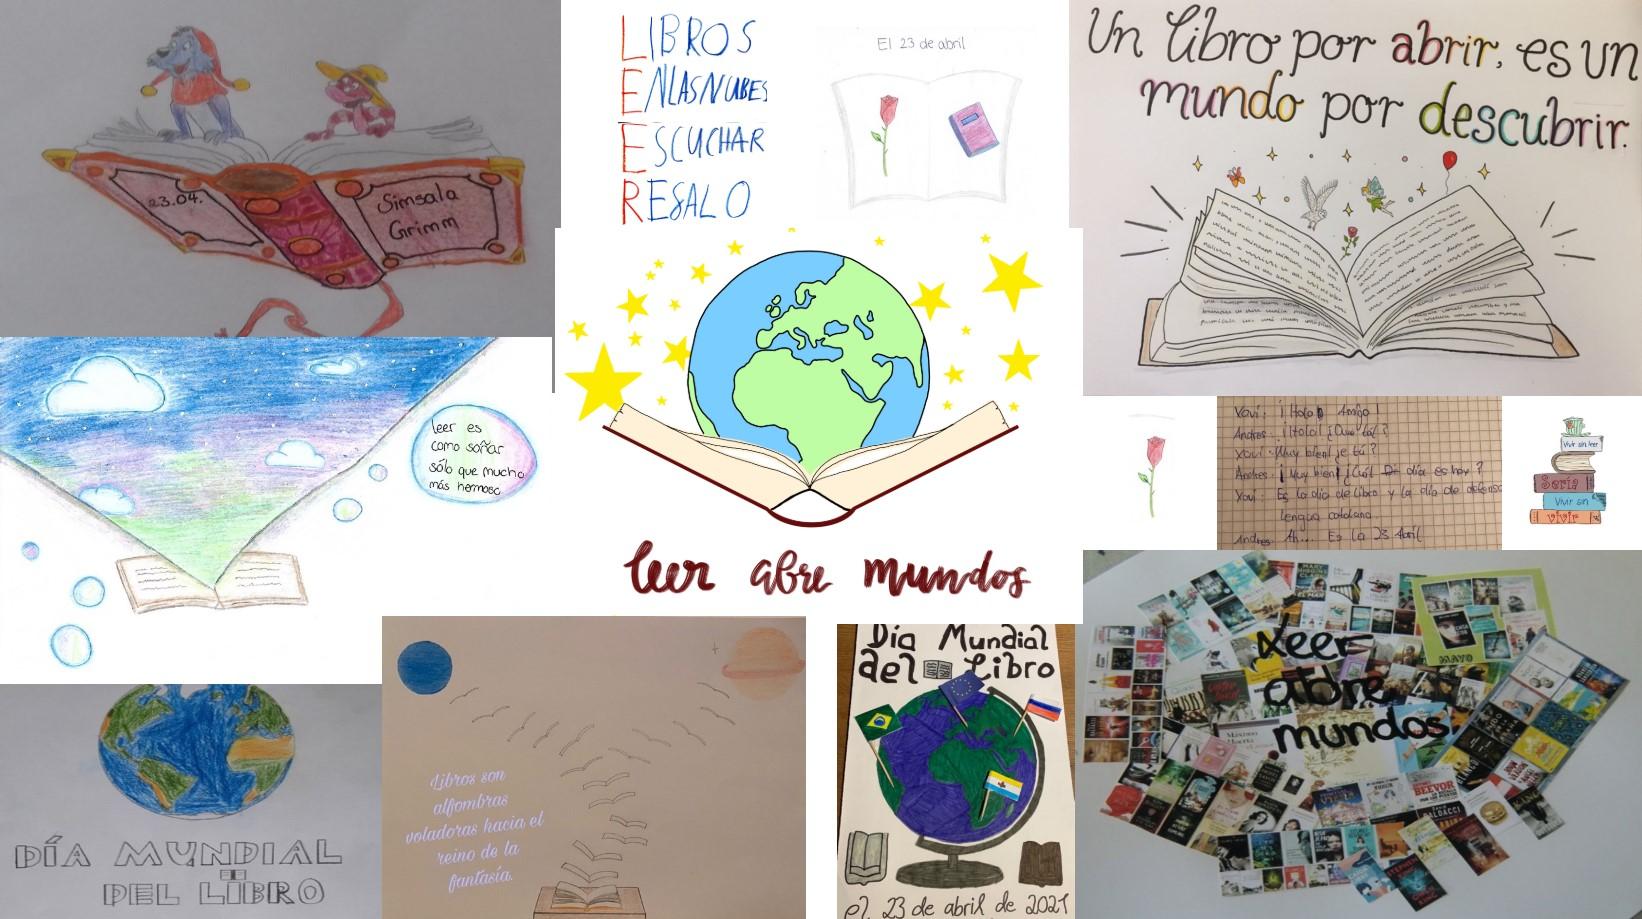 Leer abre mundos_8cd